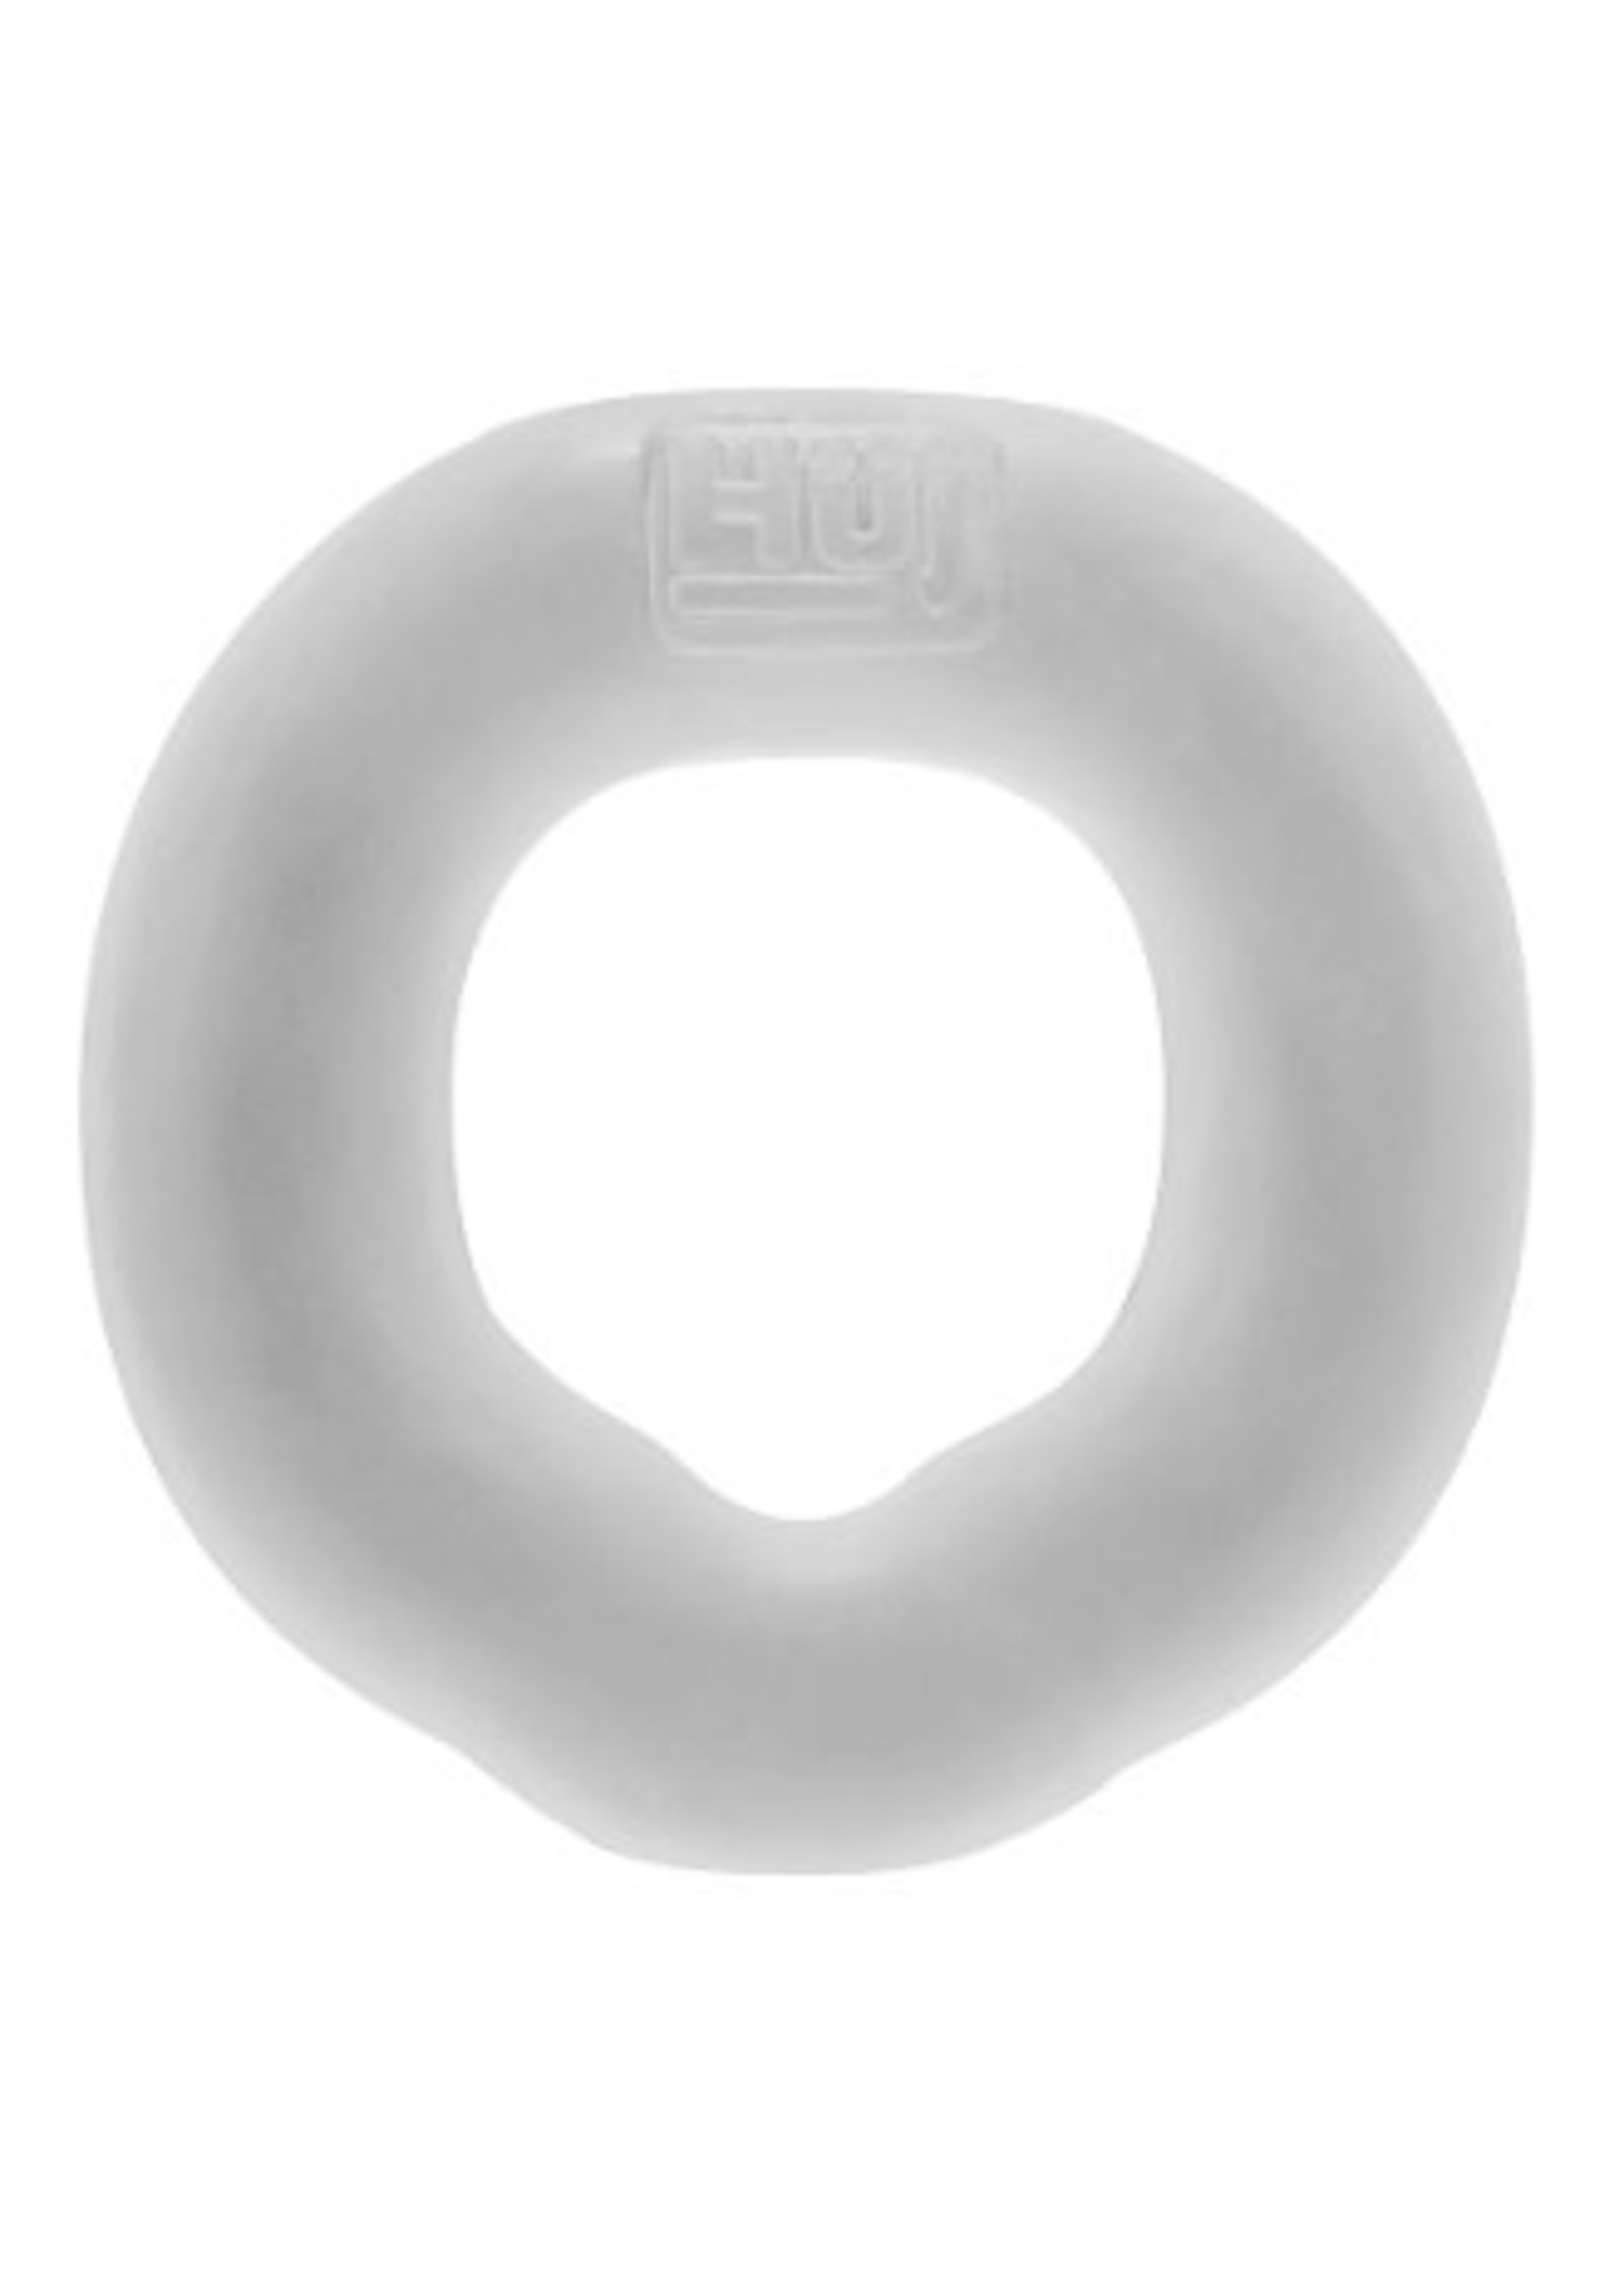 Hunkyjunk Fit Ergo C-ring Ice